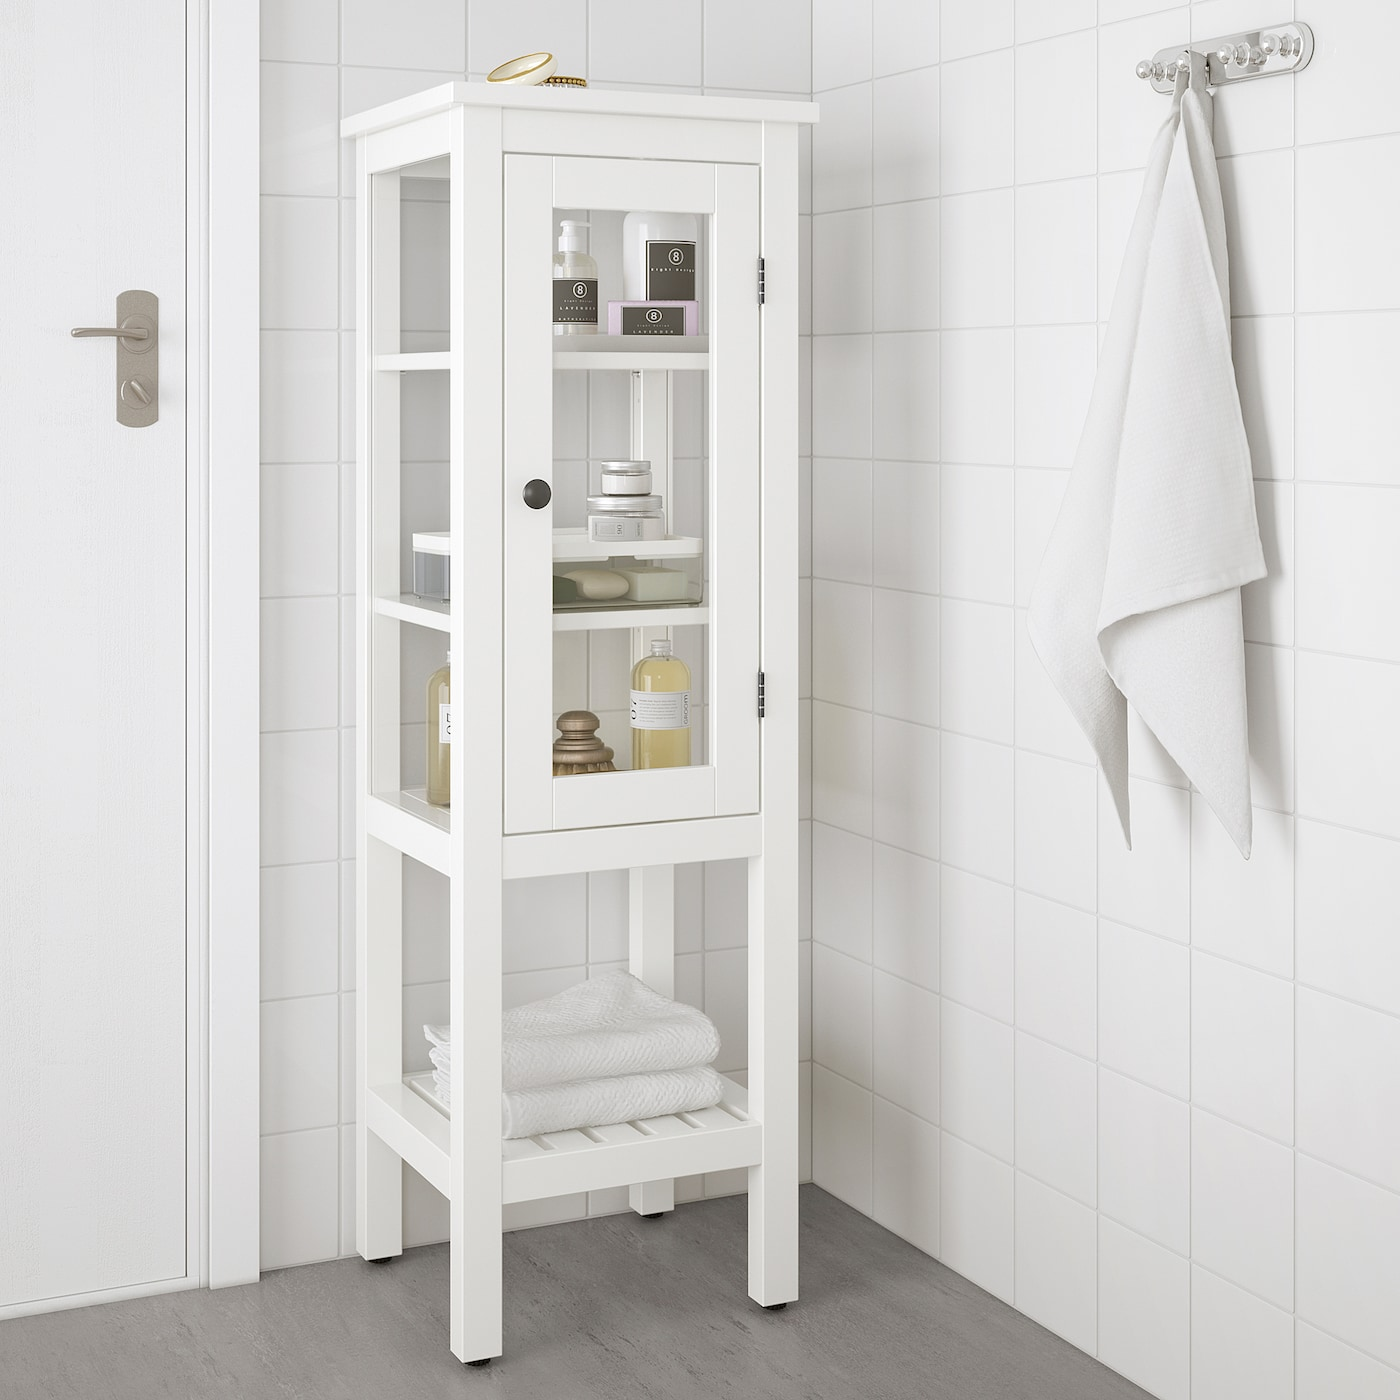 HEMNES High cabinet with glass door, white, 42x38x131 cm